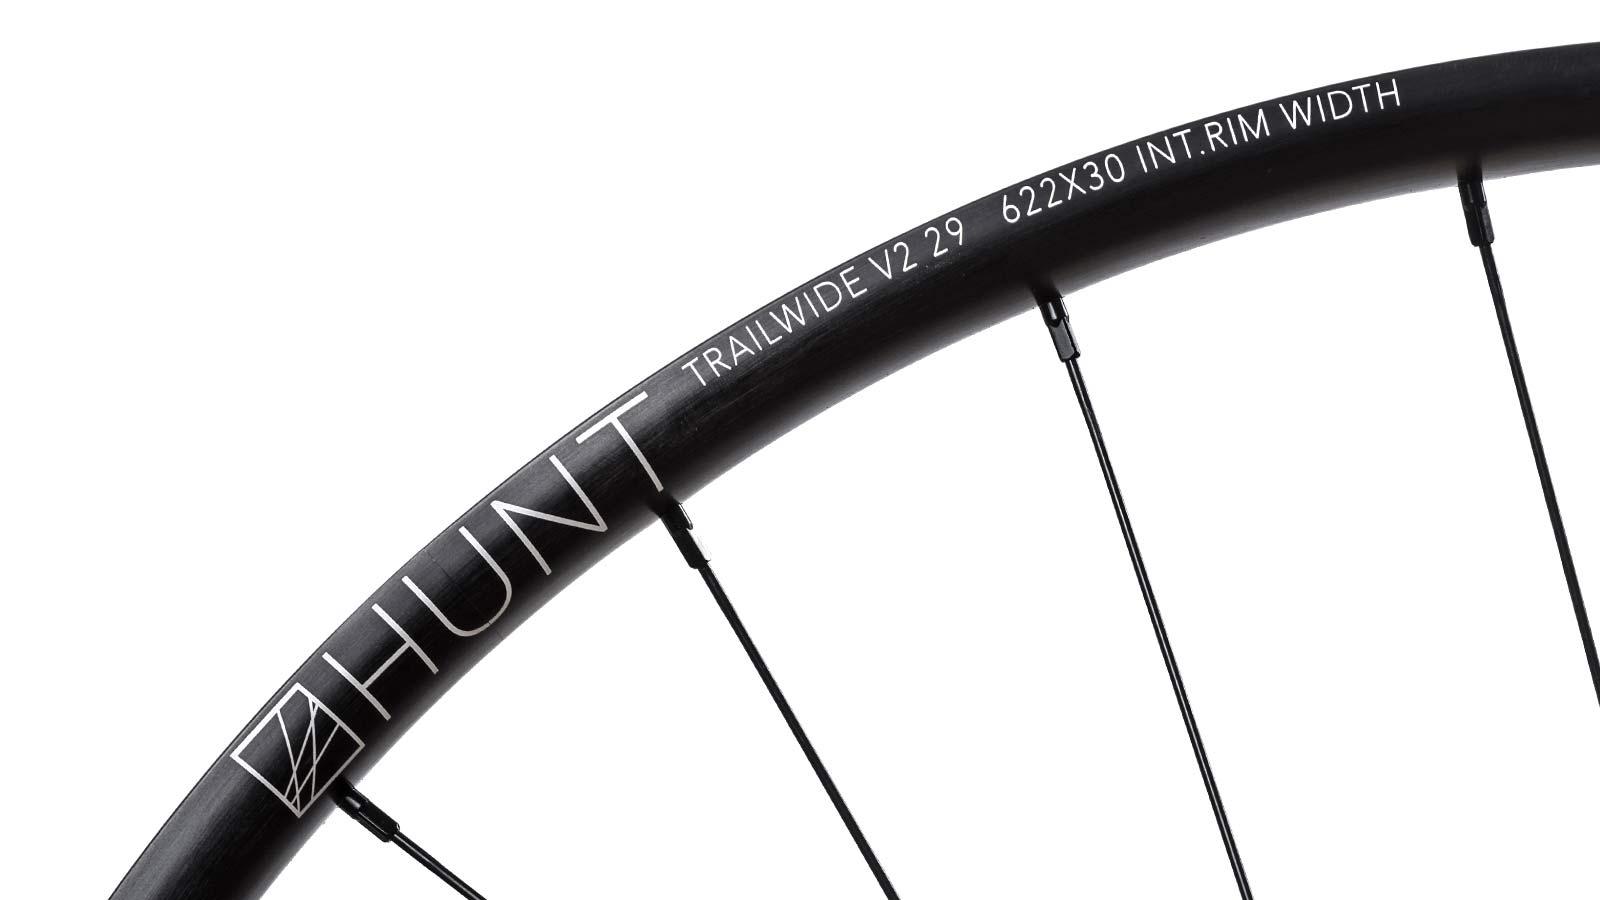 Hunt Trail Wide v2 versatile alloy mountain bike wheels, rim detail